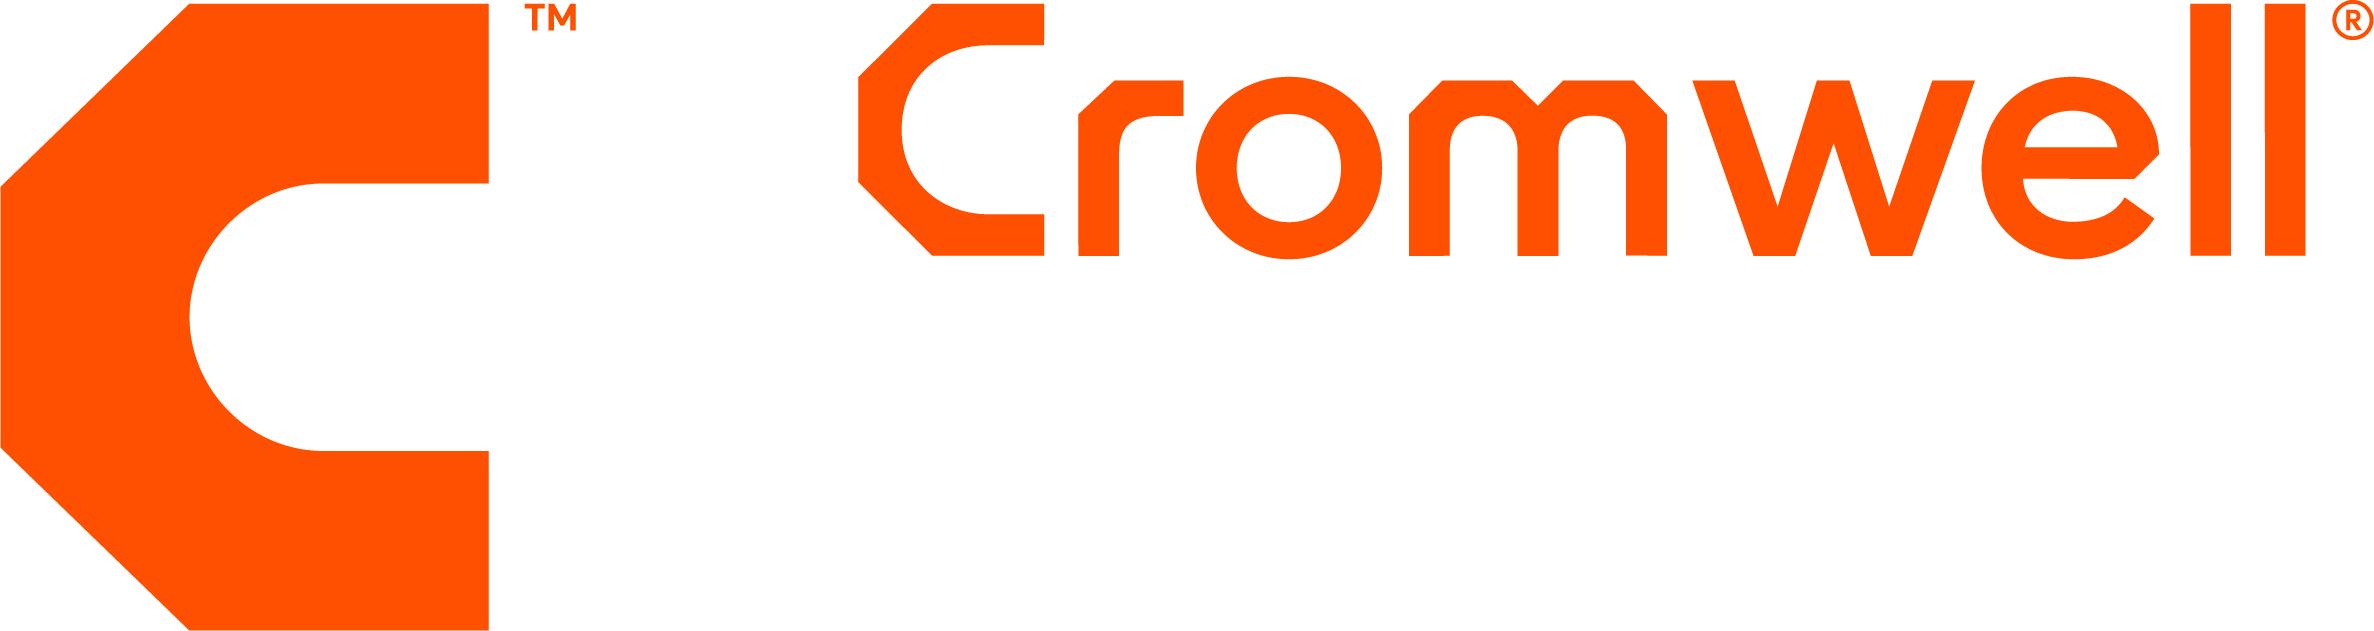 Cromwell_Primary Lockup_RGB_Orange